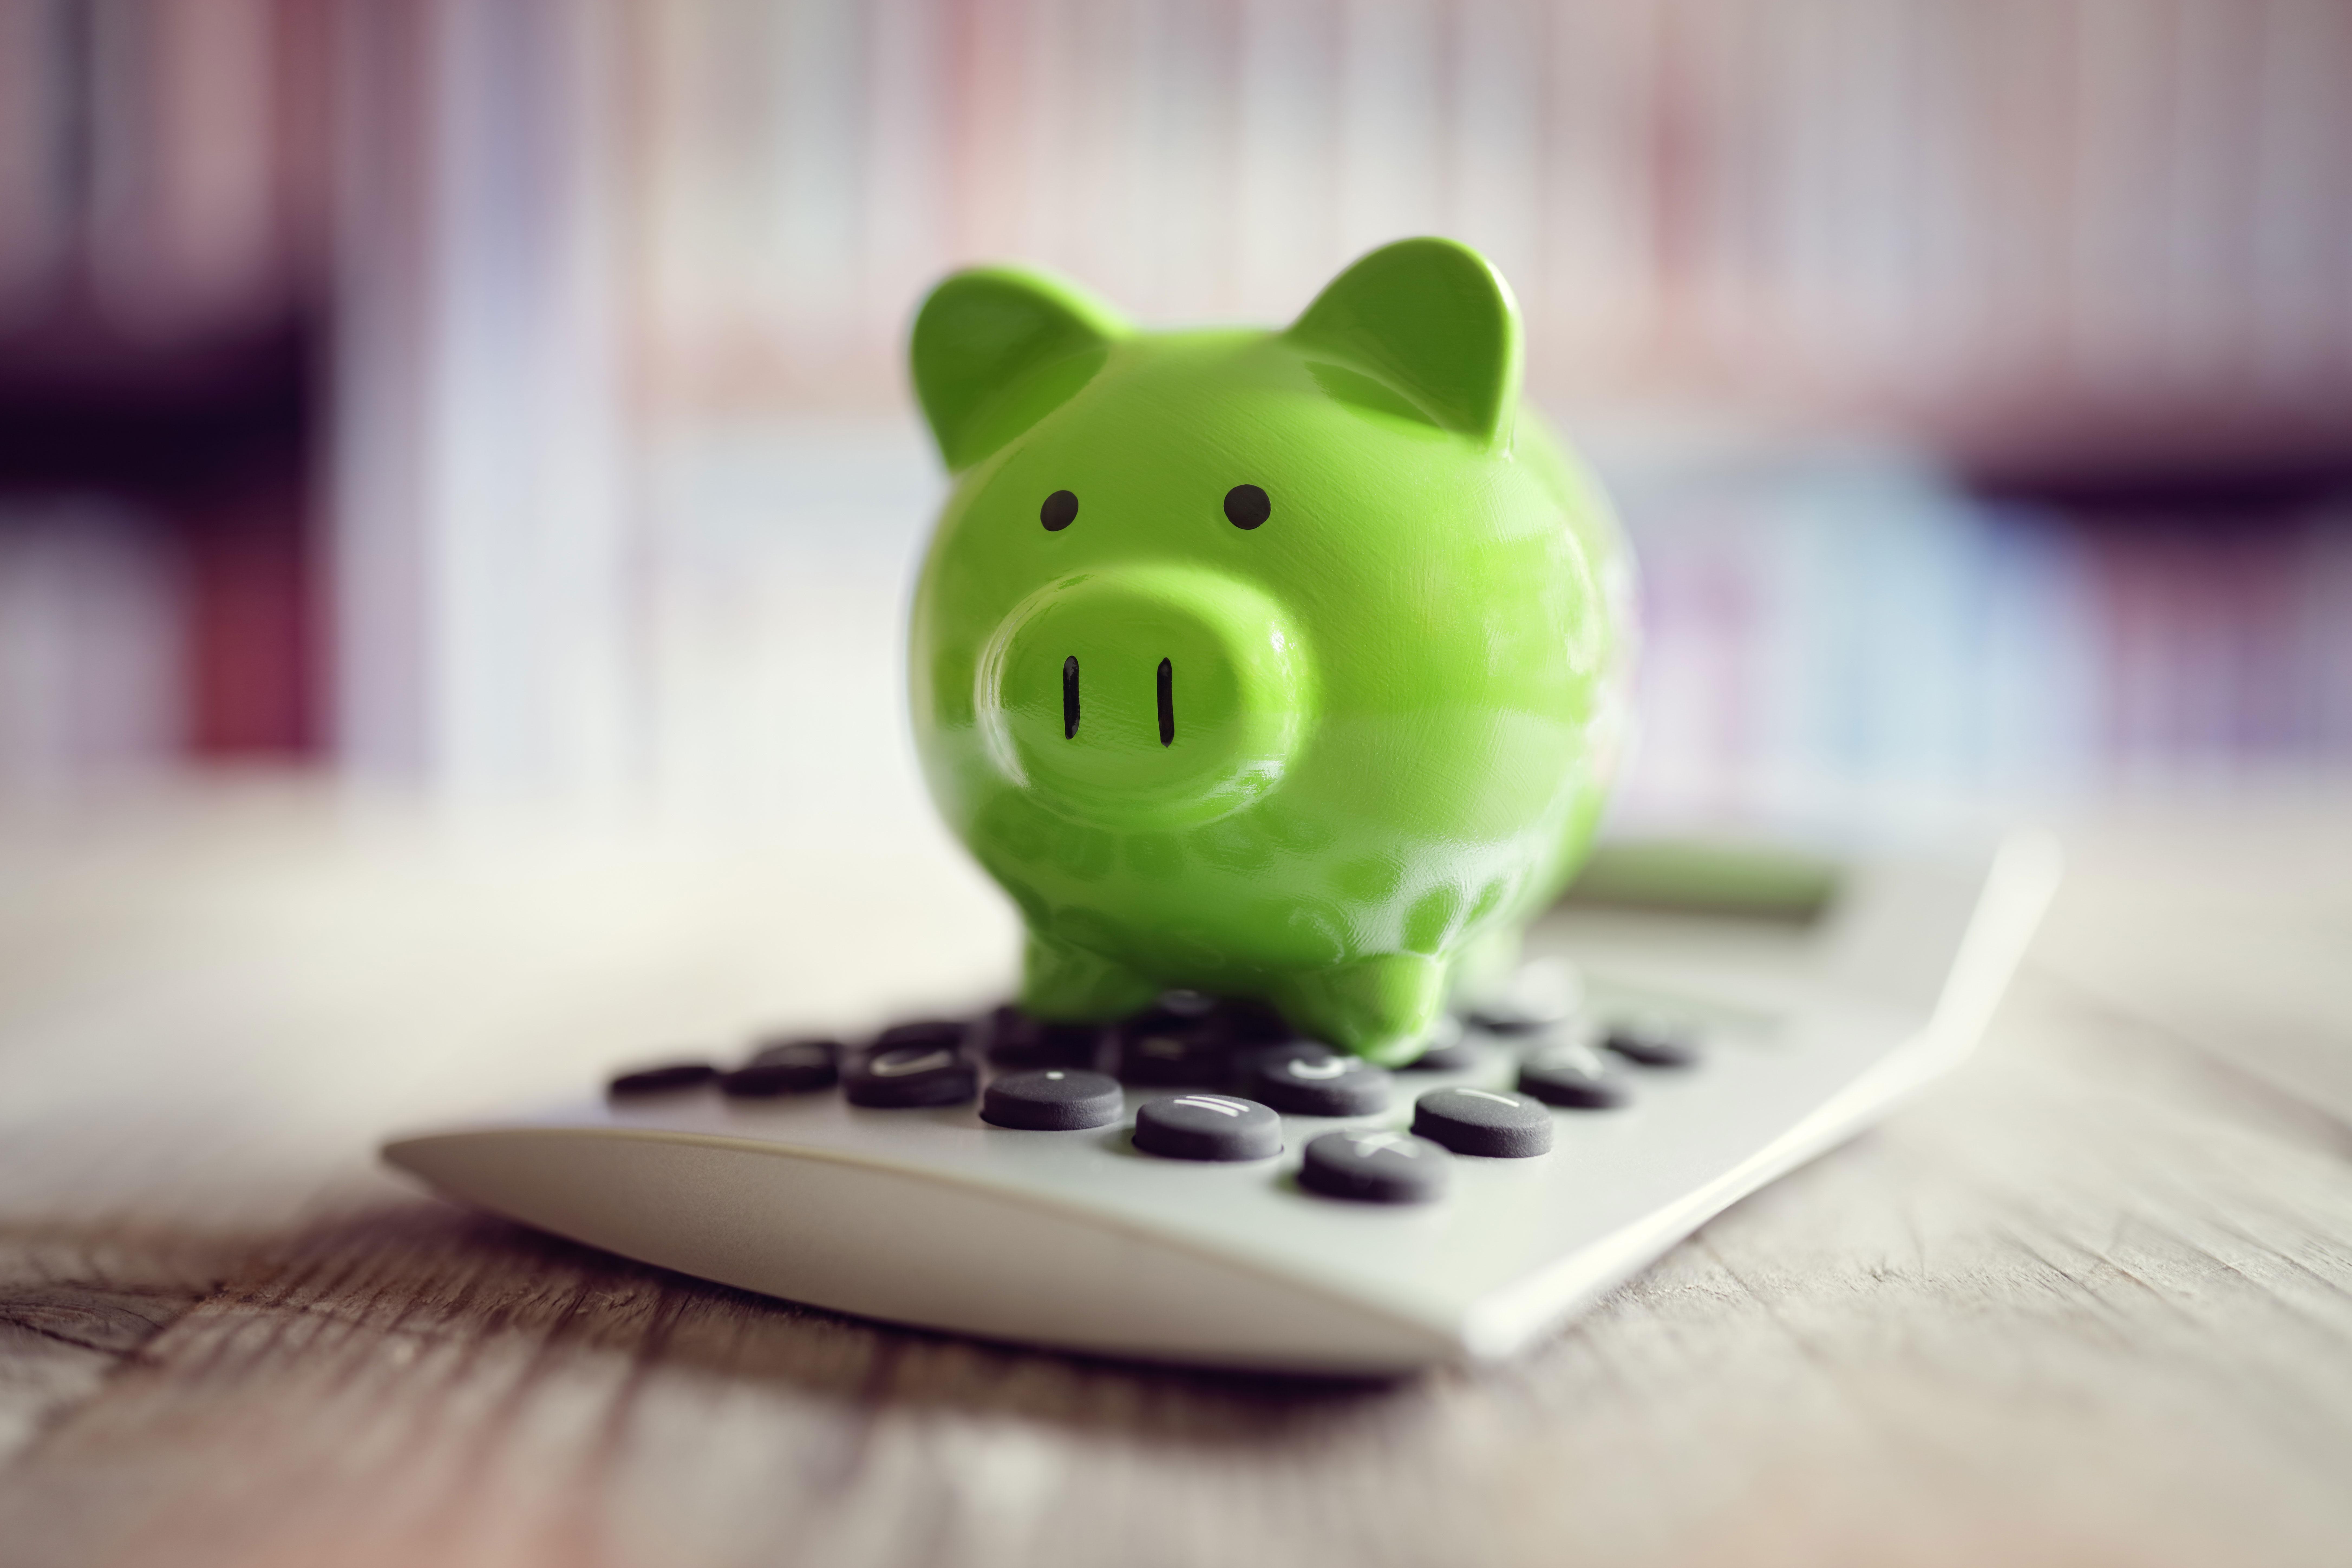 ahorra costes con tu centralita VoIP